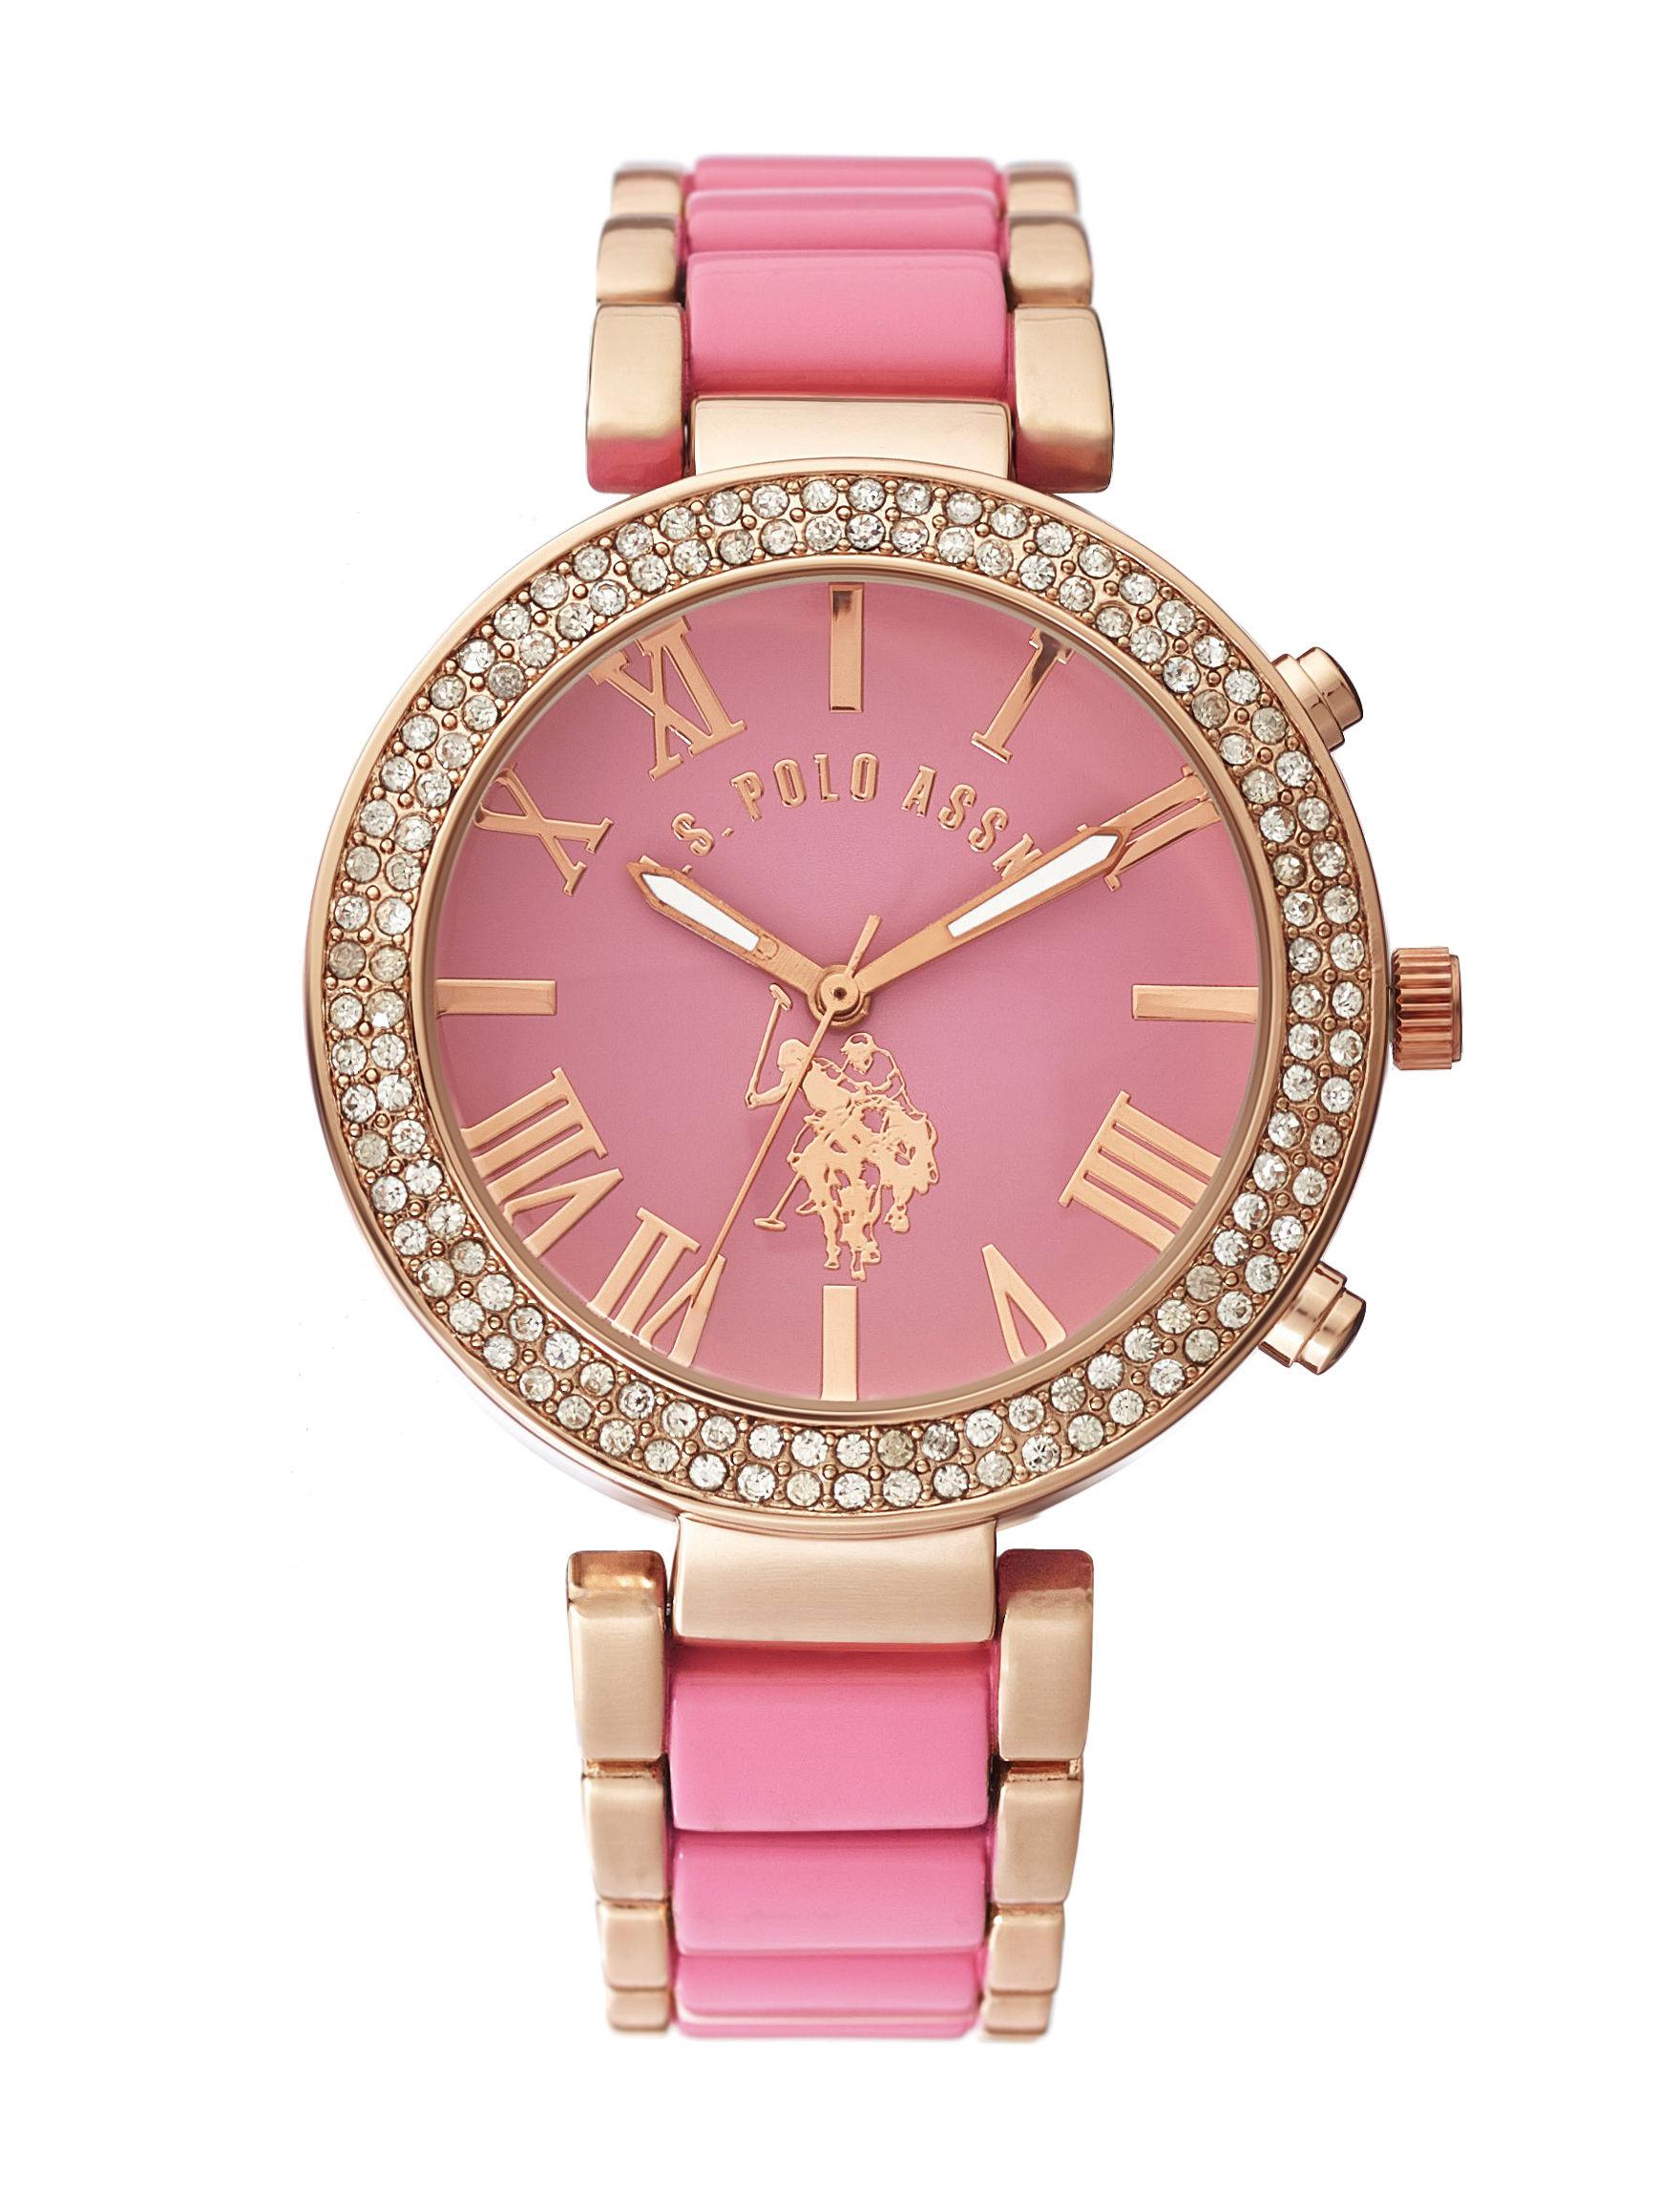 U.S. Polo Assn. Gold Fashion Watches